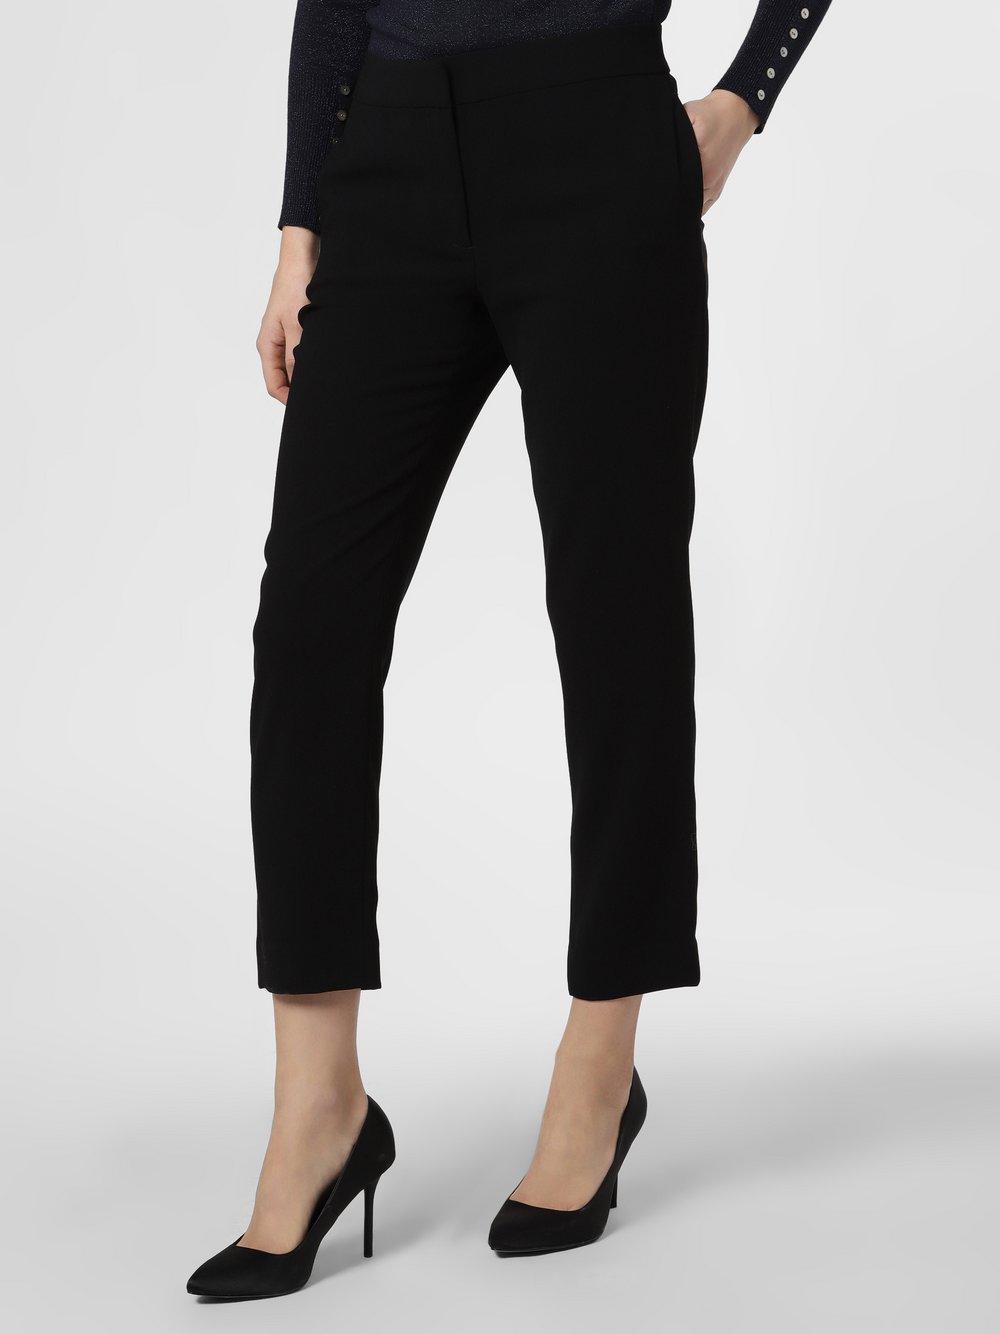 STEFFEN SCHRAUT – Spodnie damskie, czarny Van Graaf 462151-0001